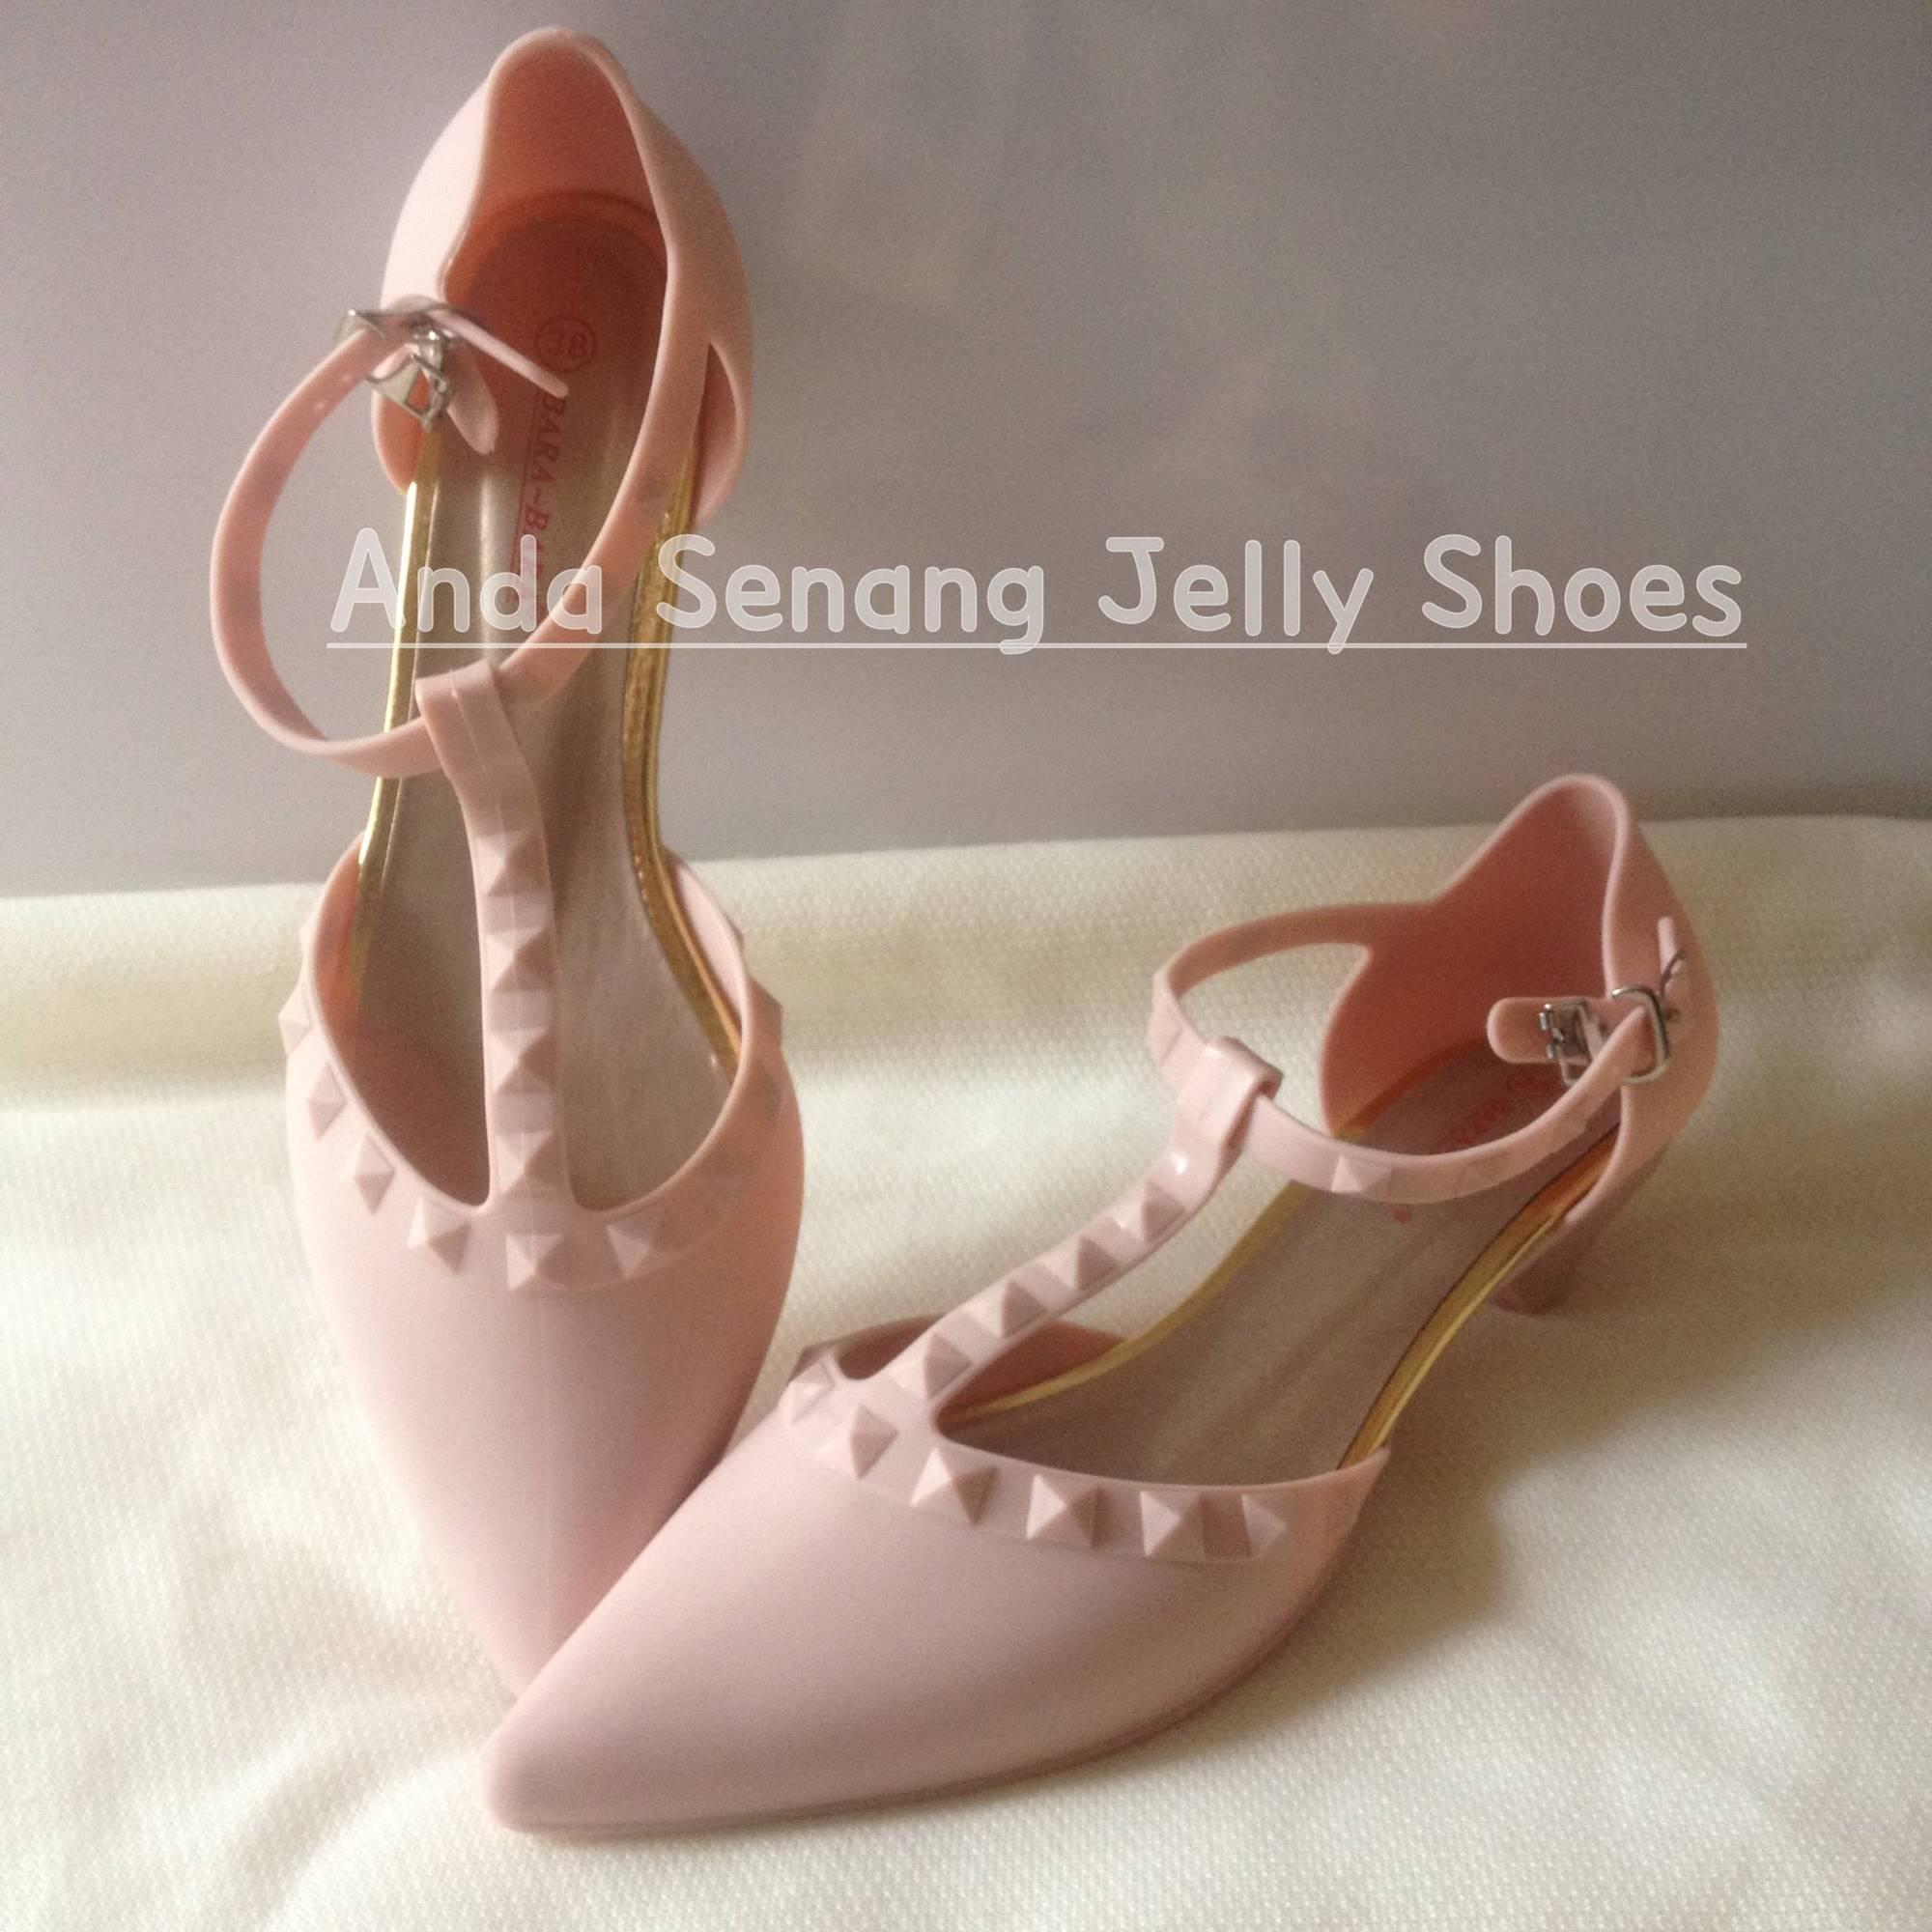 Buy Sell Cheapest Jelly Shoes Lancip Best Quality Product Deals Yumeida Sepatu Kerja Stude Wanita